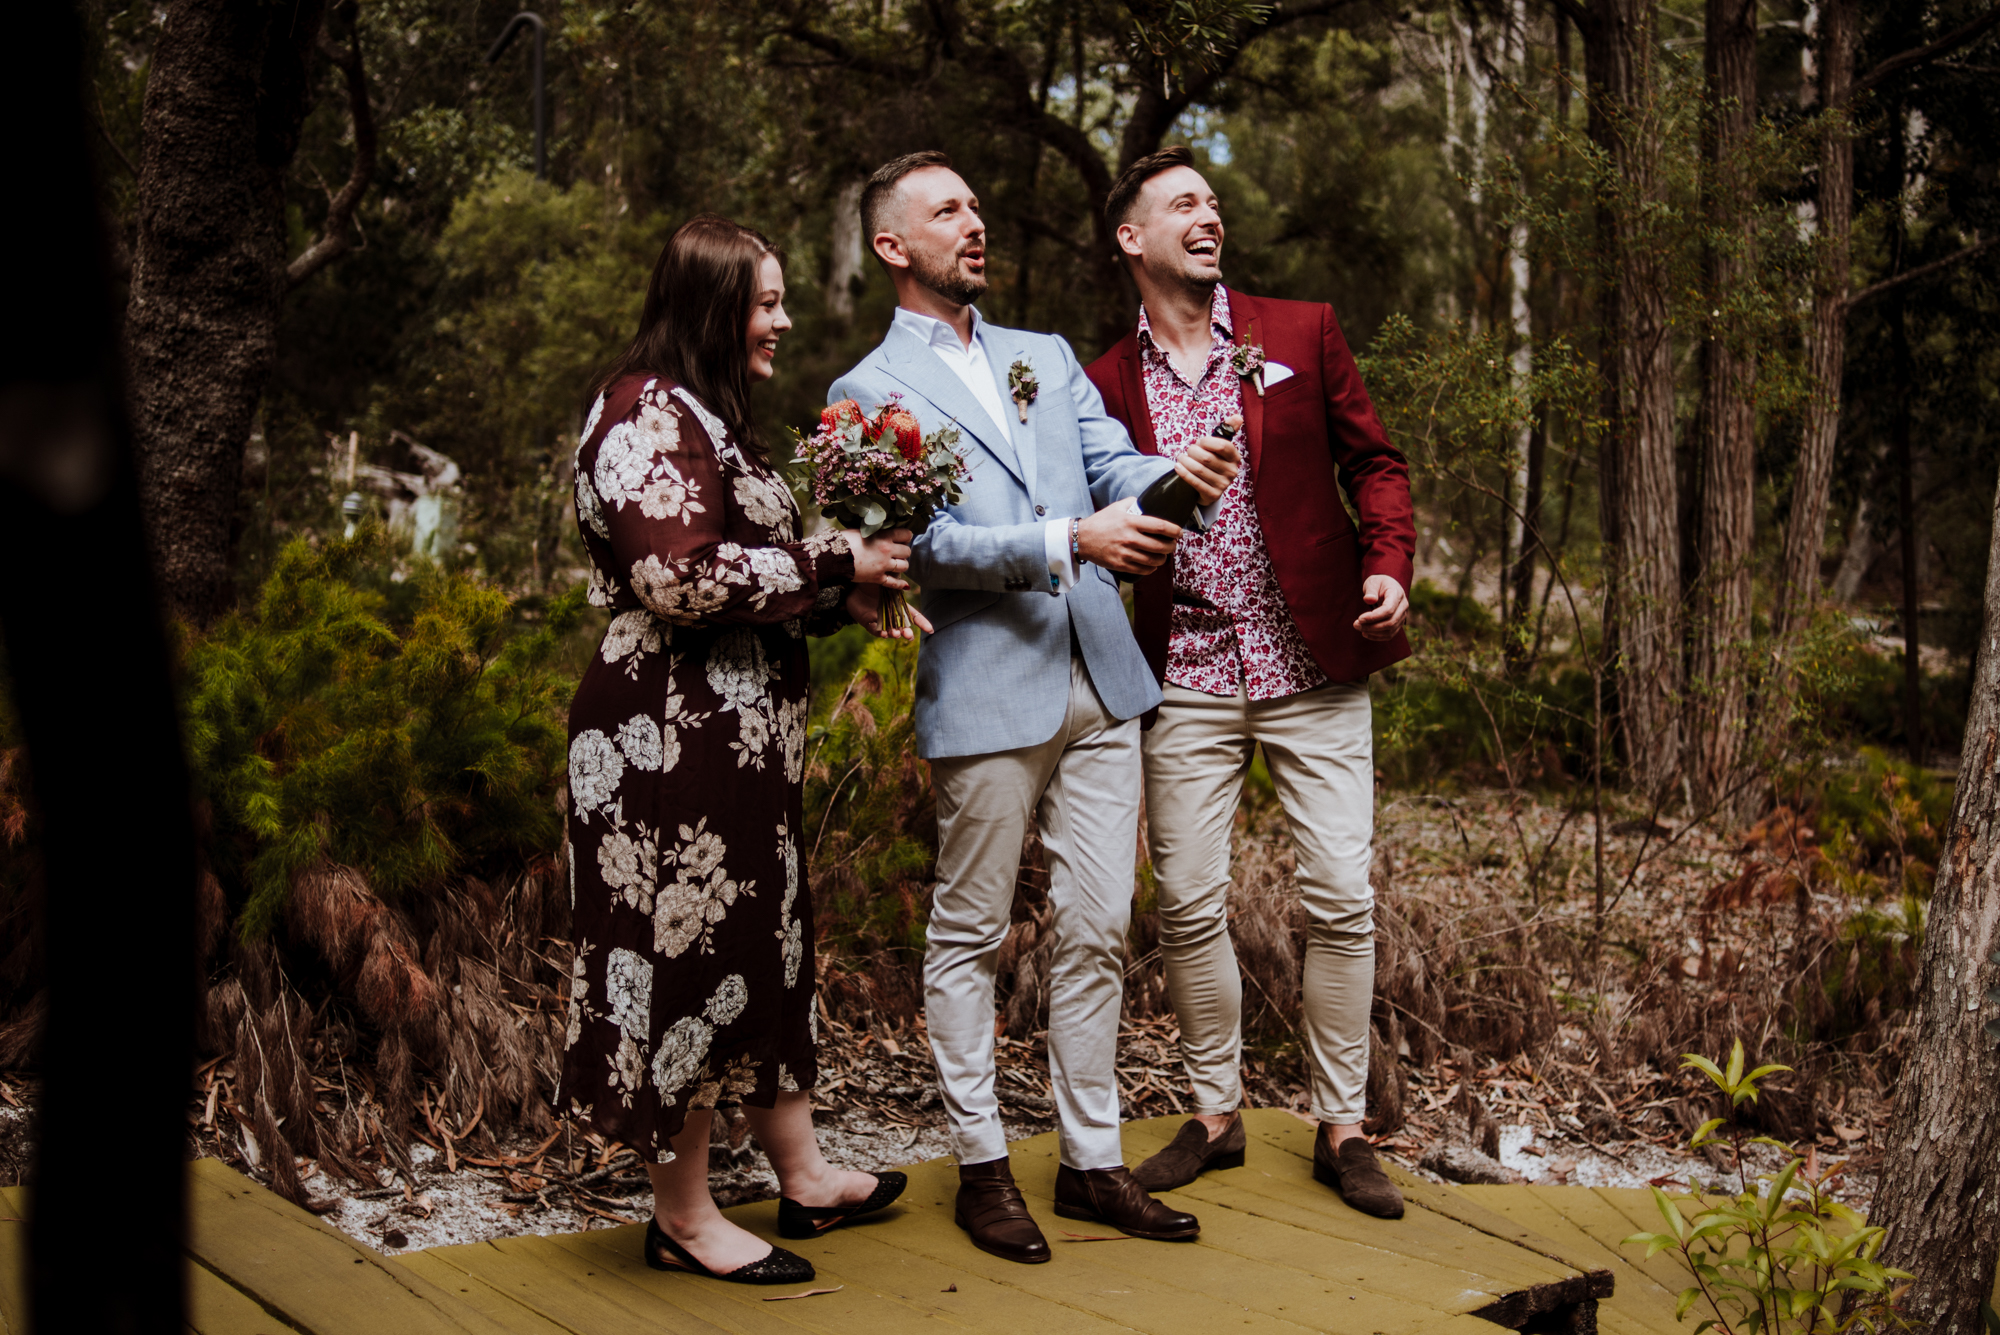 jessica-howard-photography-sean-alessandro-wedding-day-web-142.jpg